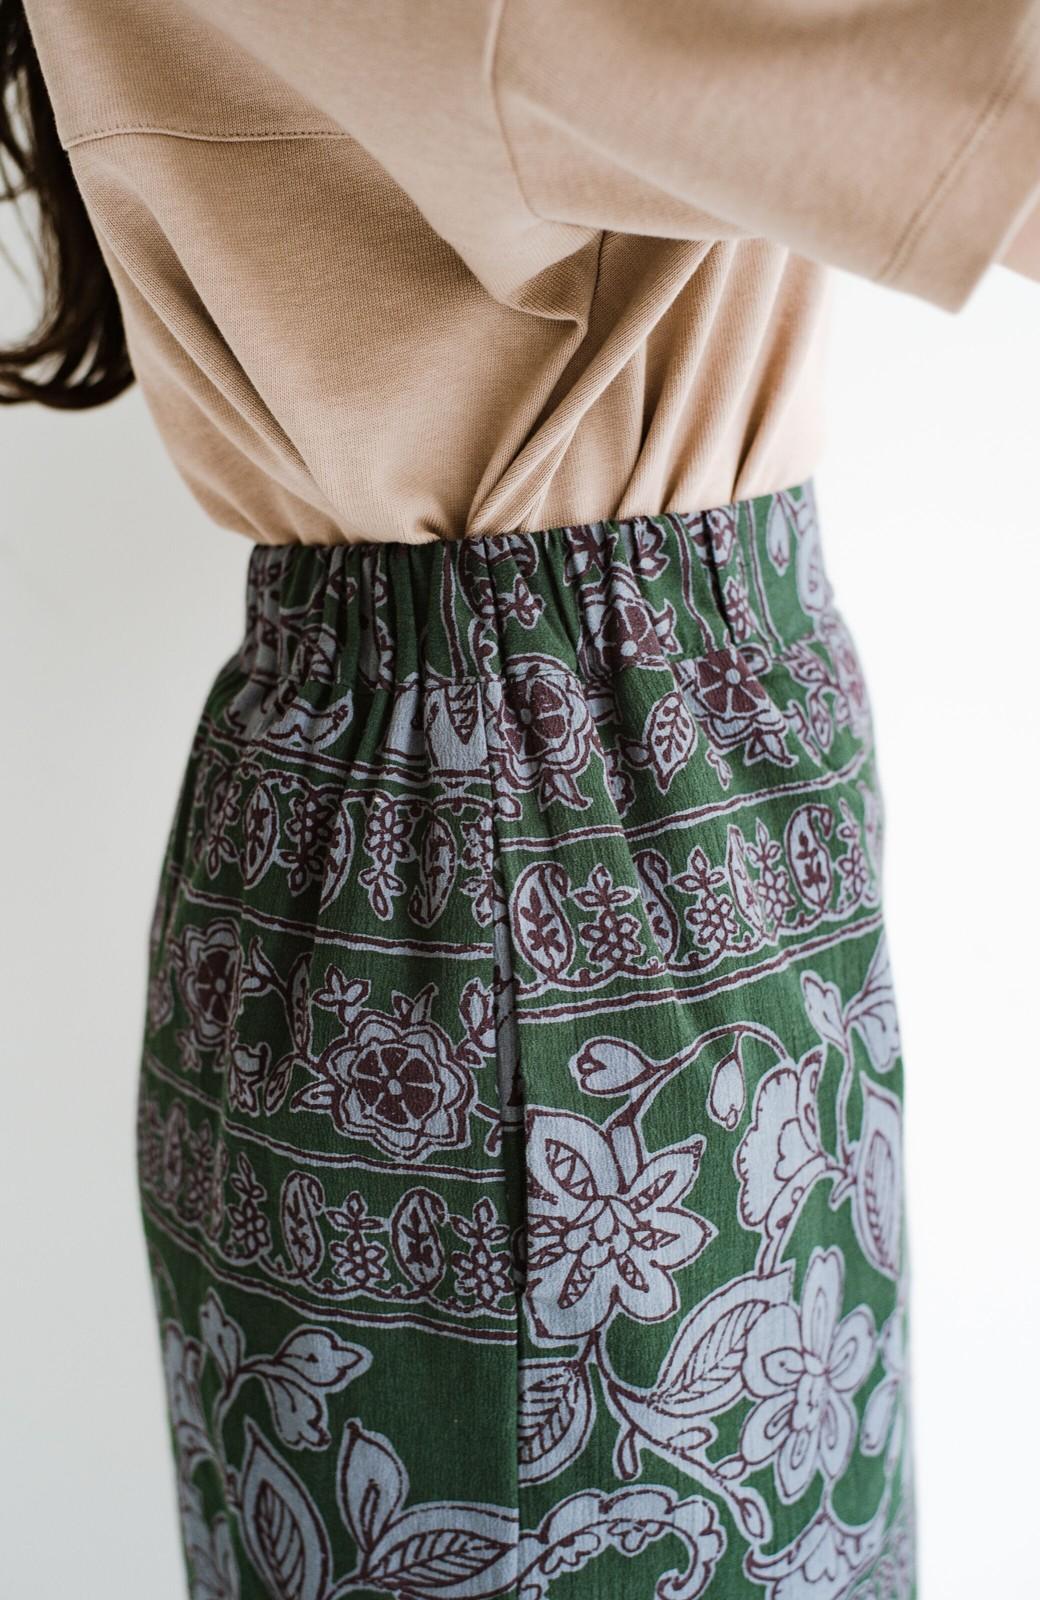 haco! 京都の浴衣屋さんと作った浴衣生地のセミタイトスカート <グリーン系その他>の商品写真10